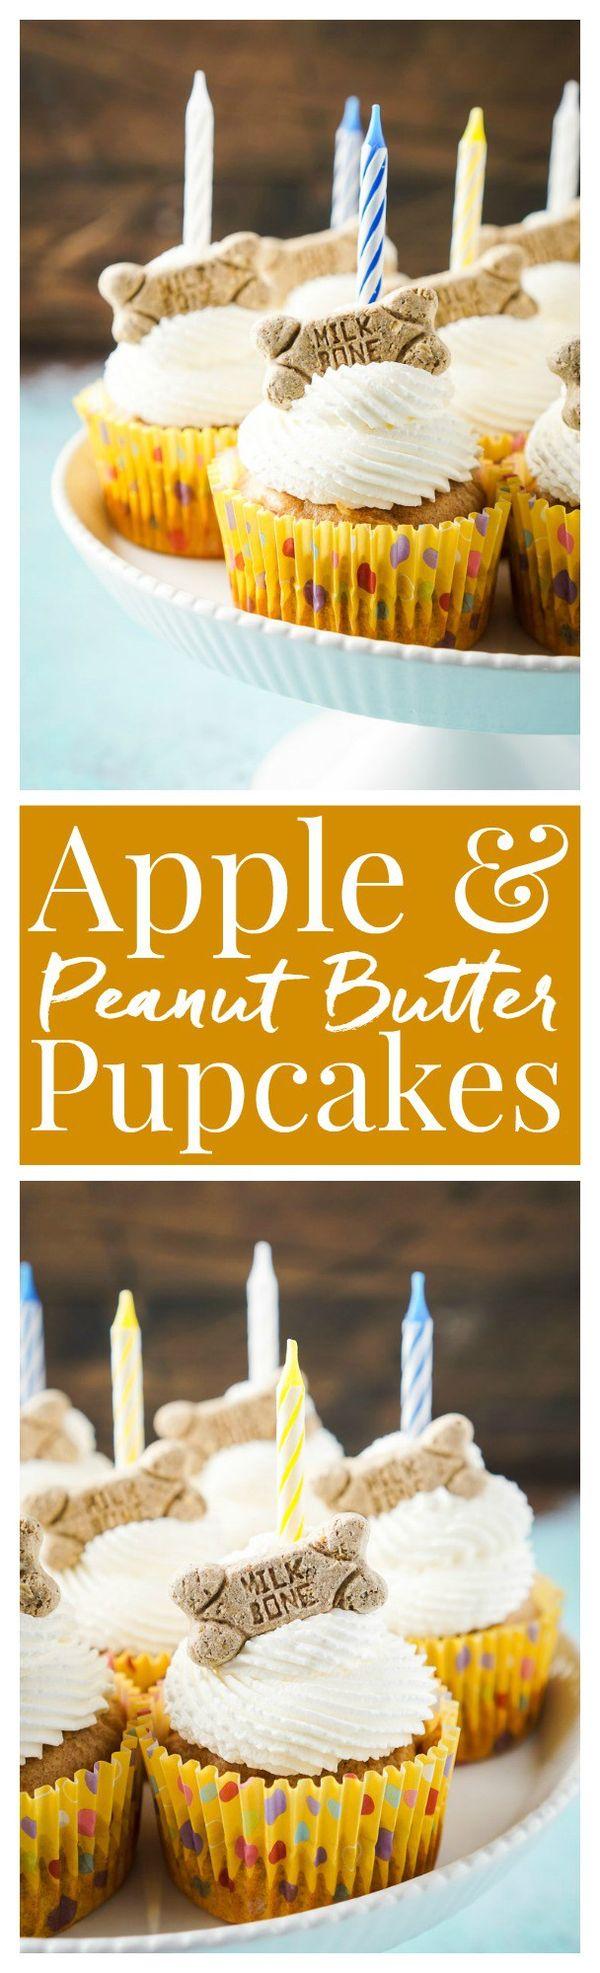 Apple & Peanut Butter Pupcakes